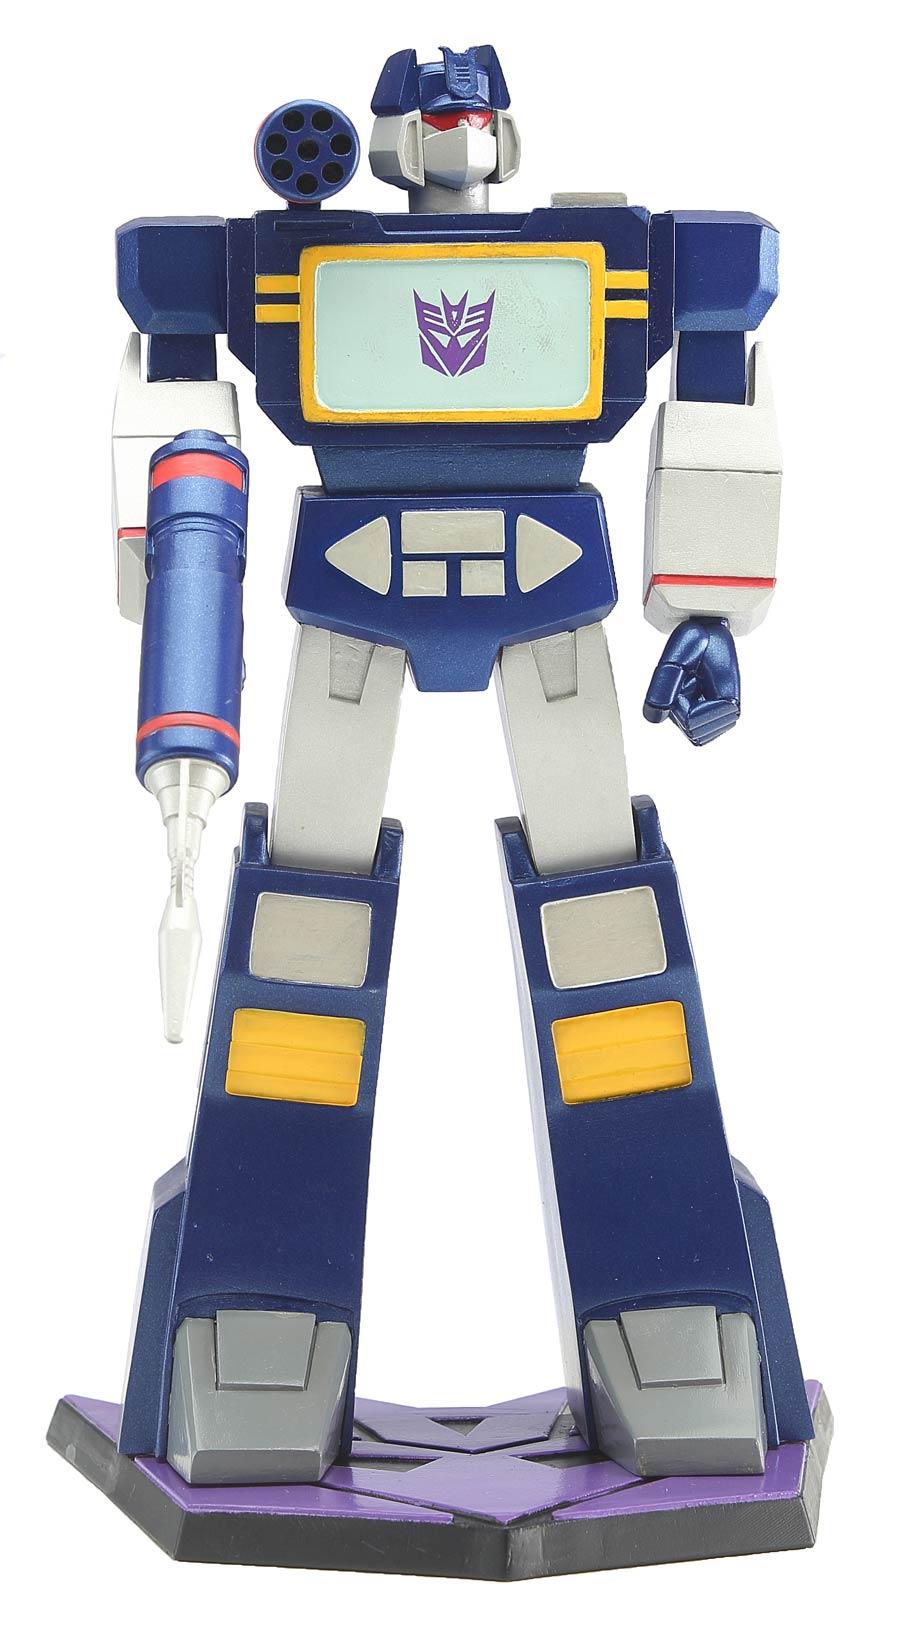 Transformers 9-Inch PVC Statue - Soundwave